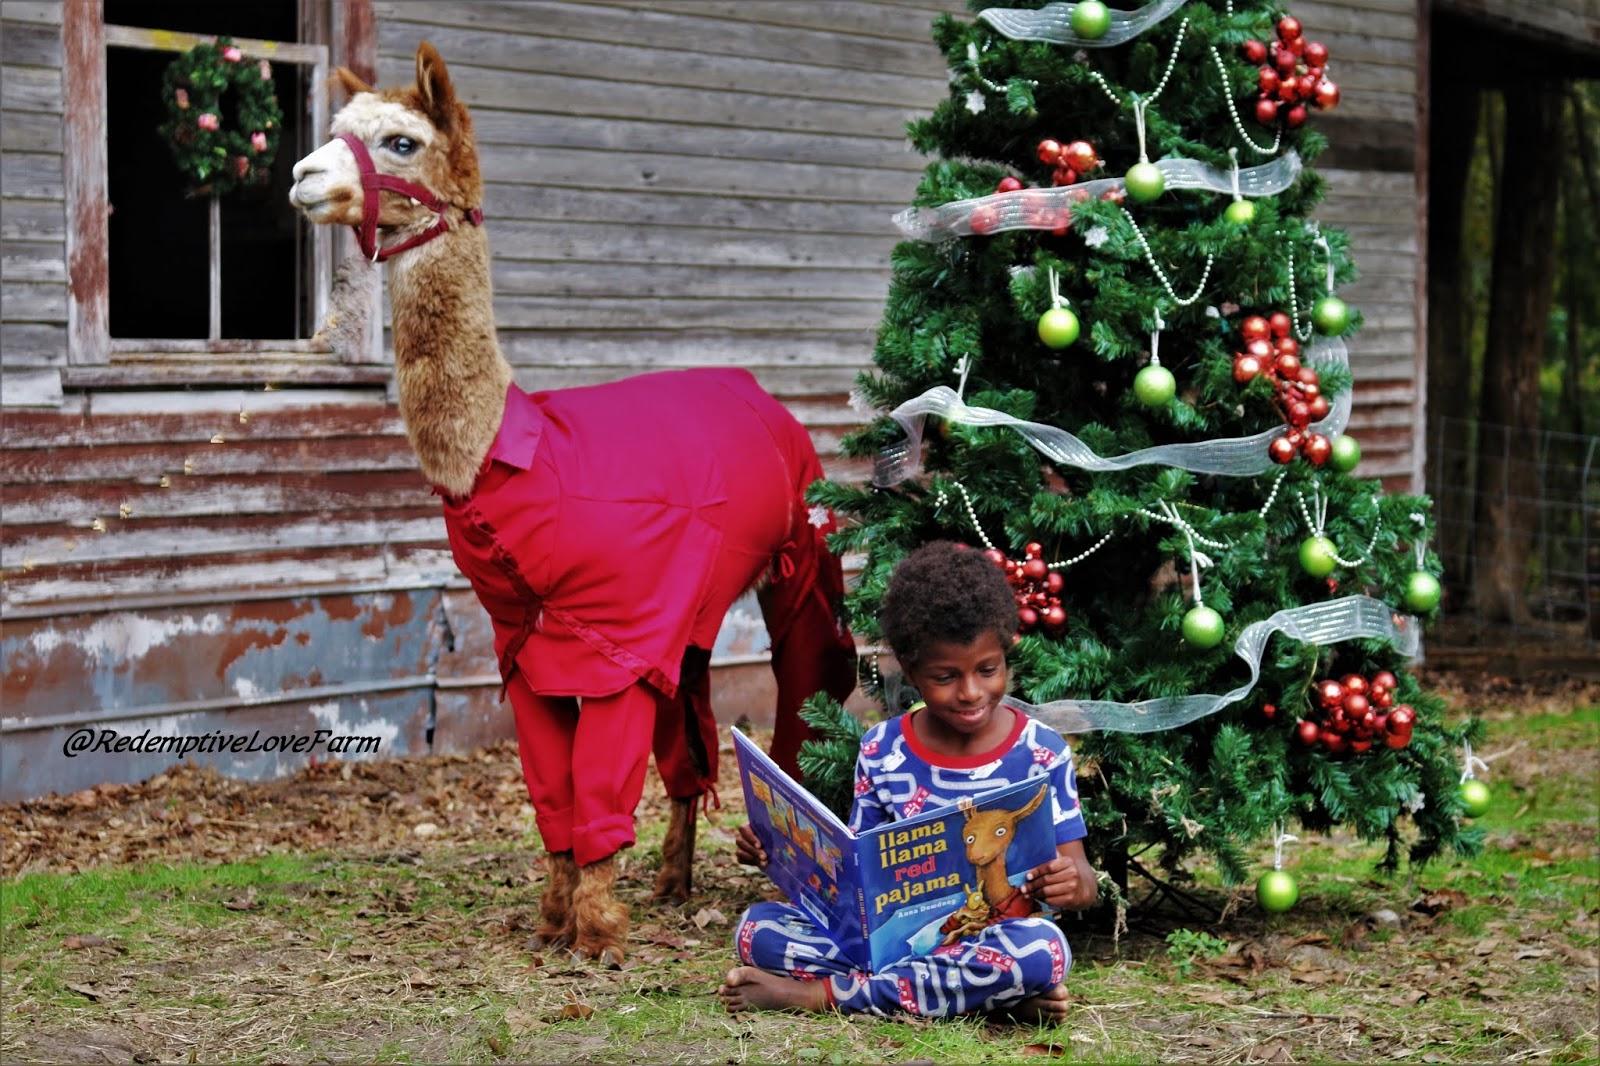 Redemptive Love Farm: Llama Costumes!!!